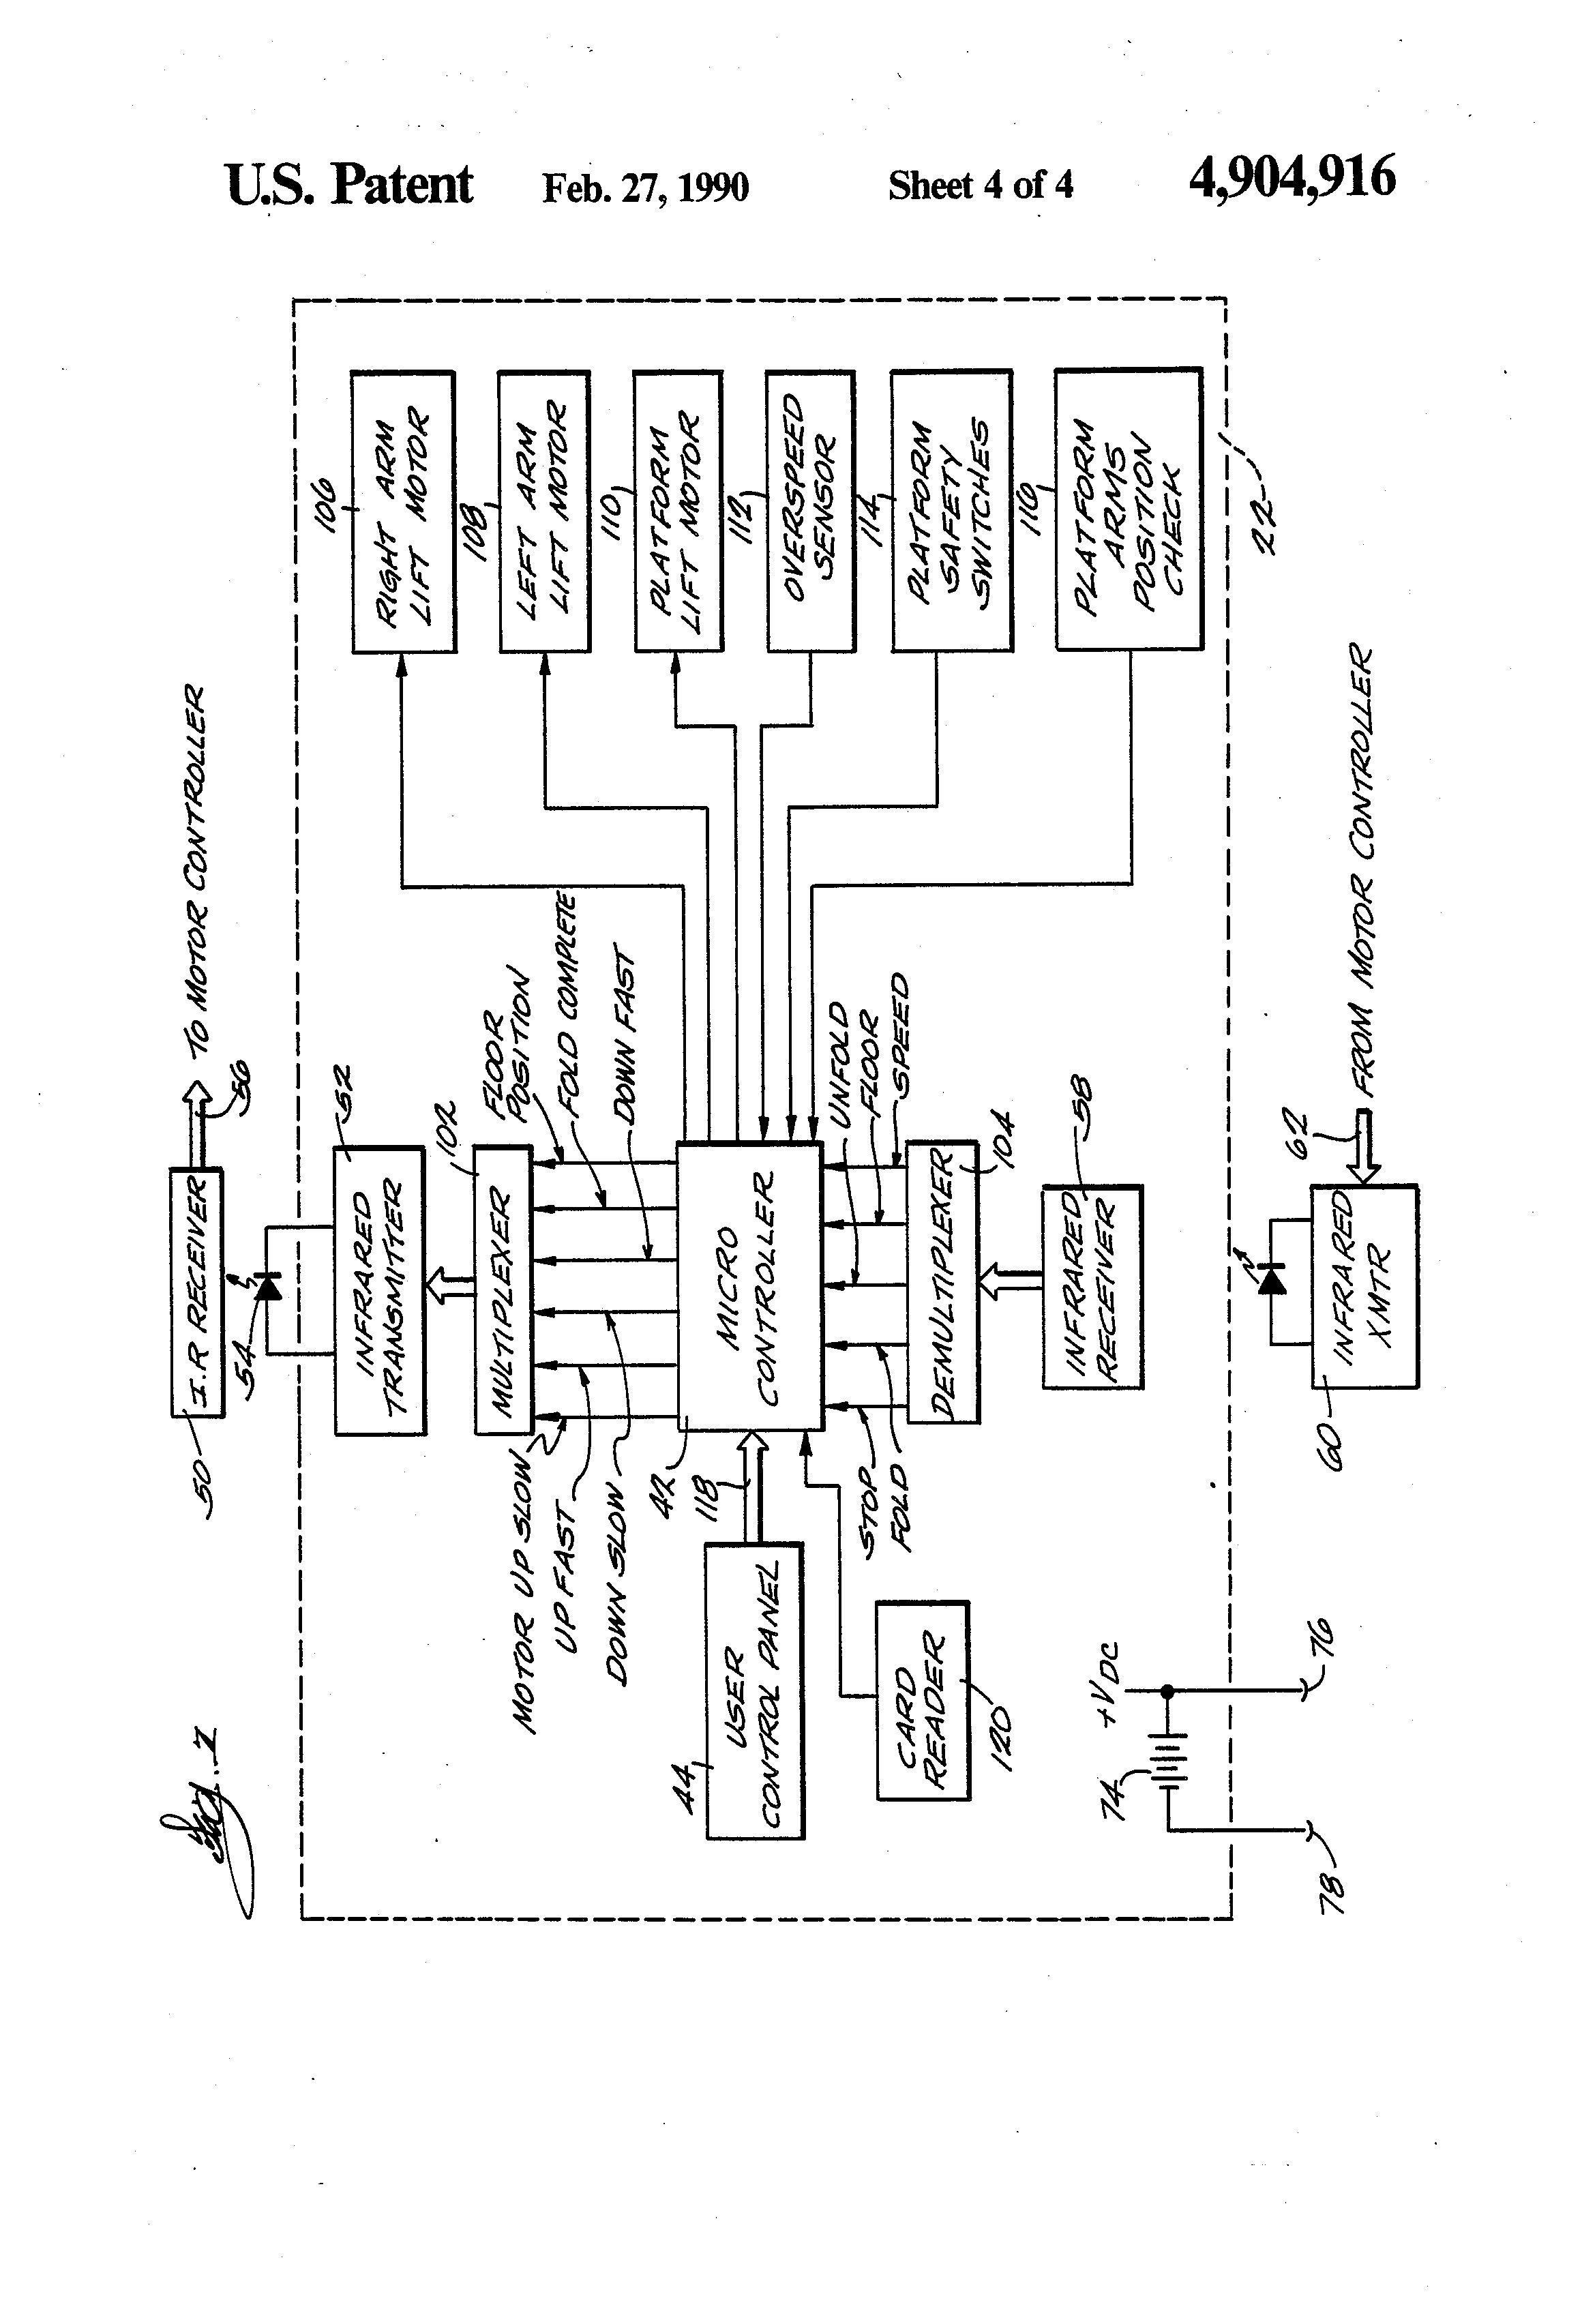 Wiring Diagram Avanza Vvti Unique 20p Wiring Diagram Diagram Scissor Lift Electrical Wiring Diagram